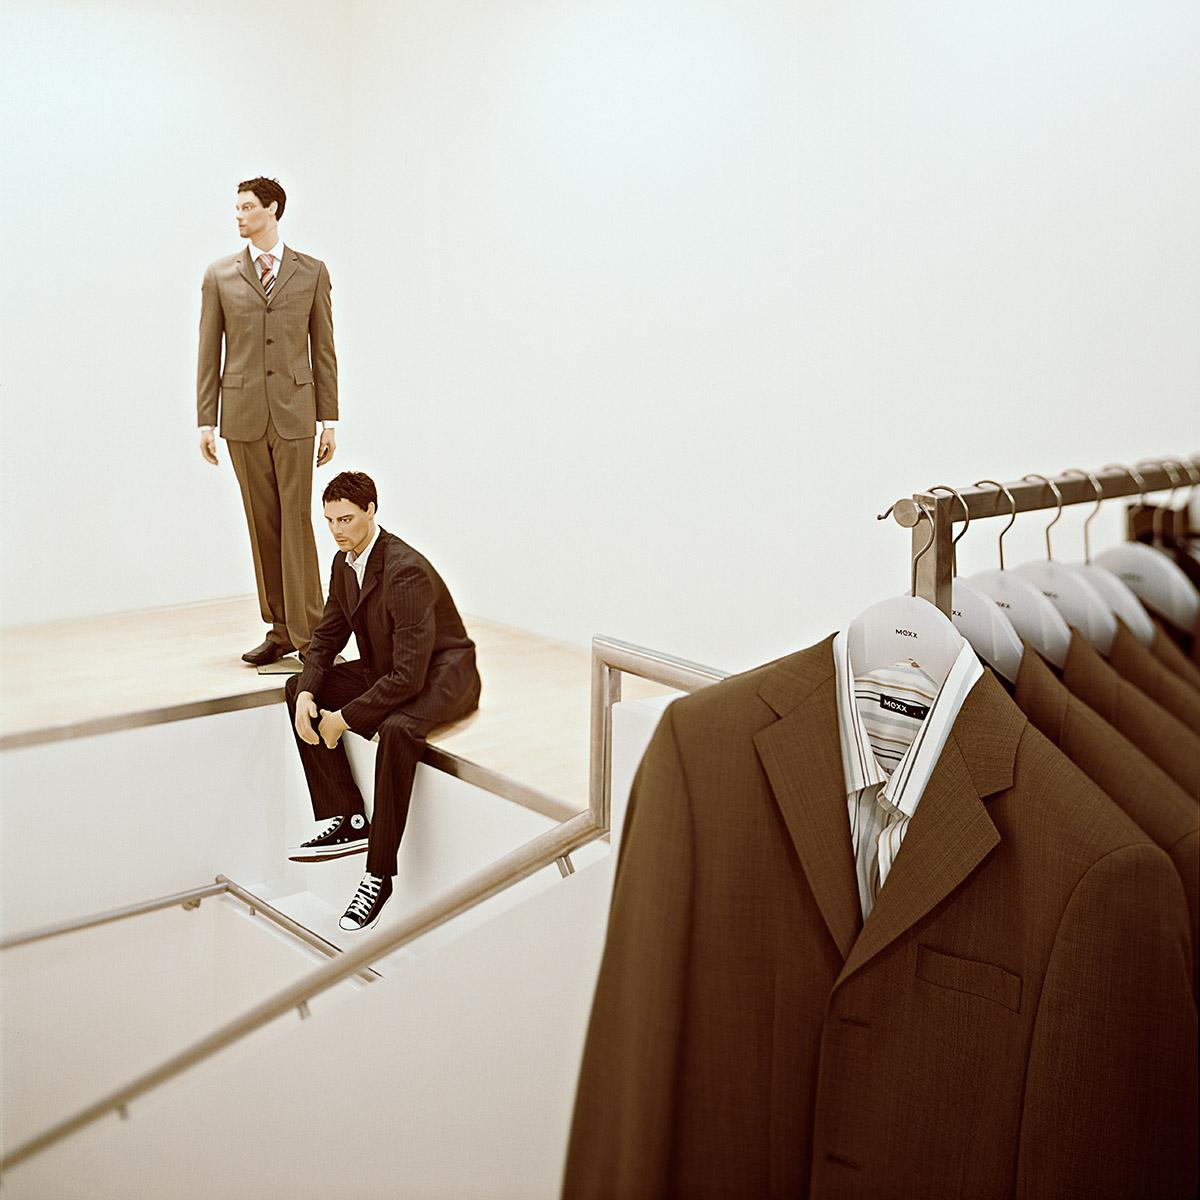 Retail interior for leading high street fashion brand.Client: Mexx Ltd